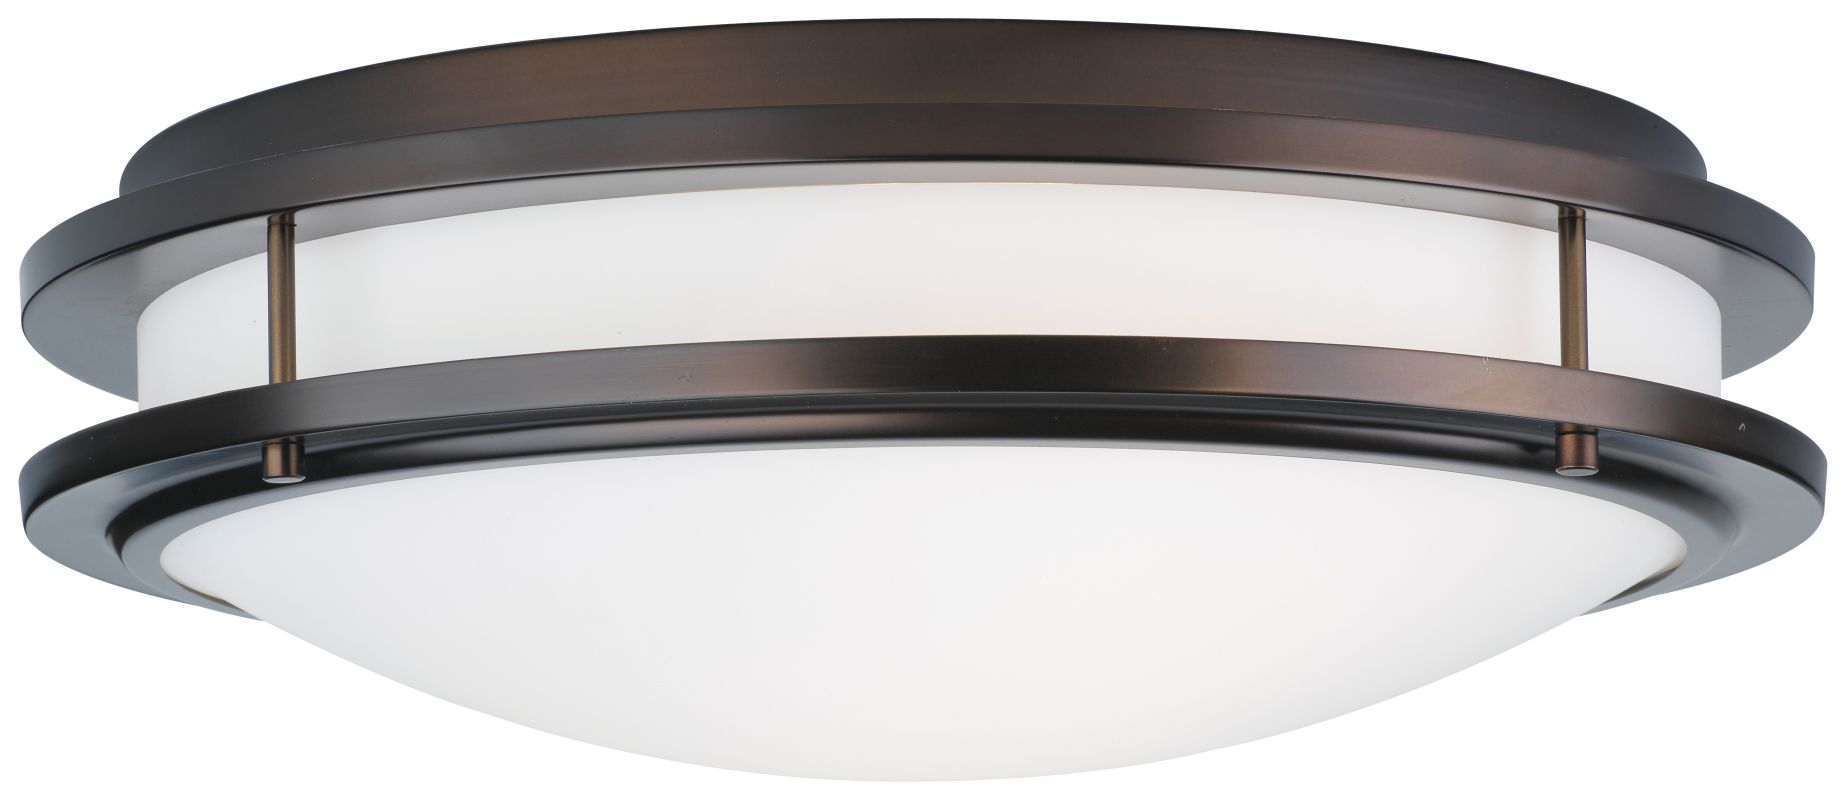 "Forecast Lighting F245770U 2 Light 18"" Wide Flush Mount Ceiling"